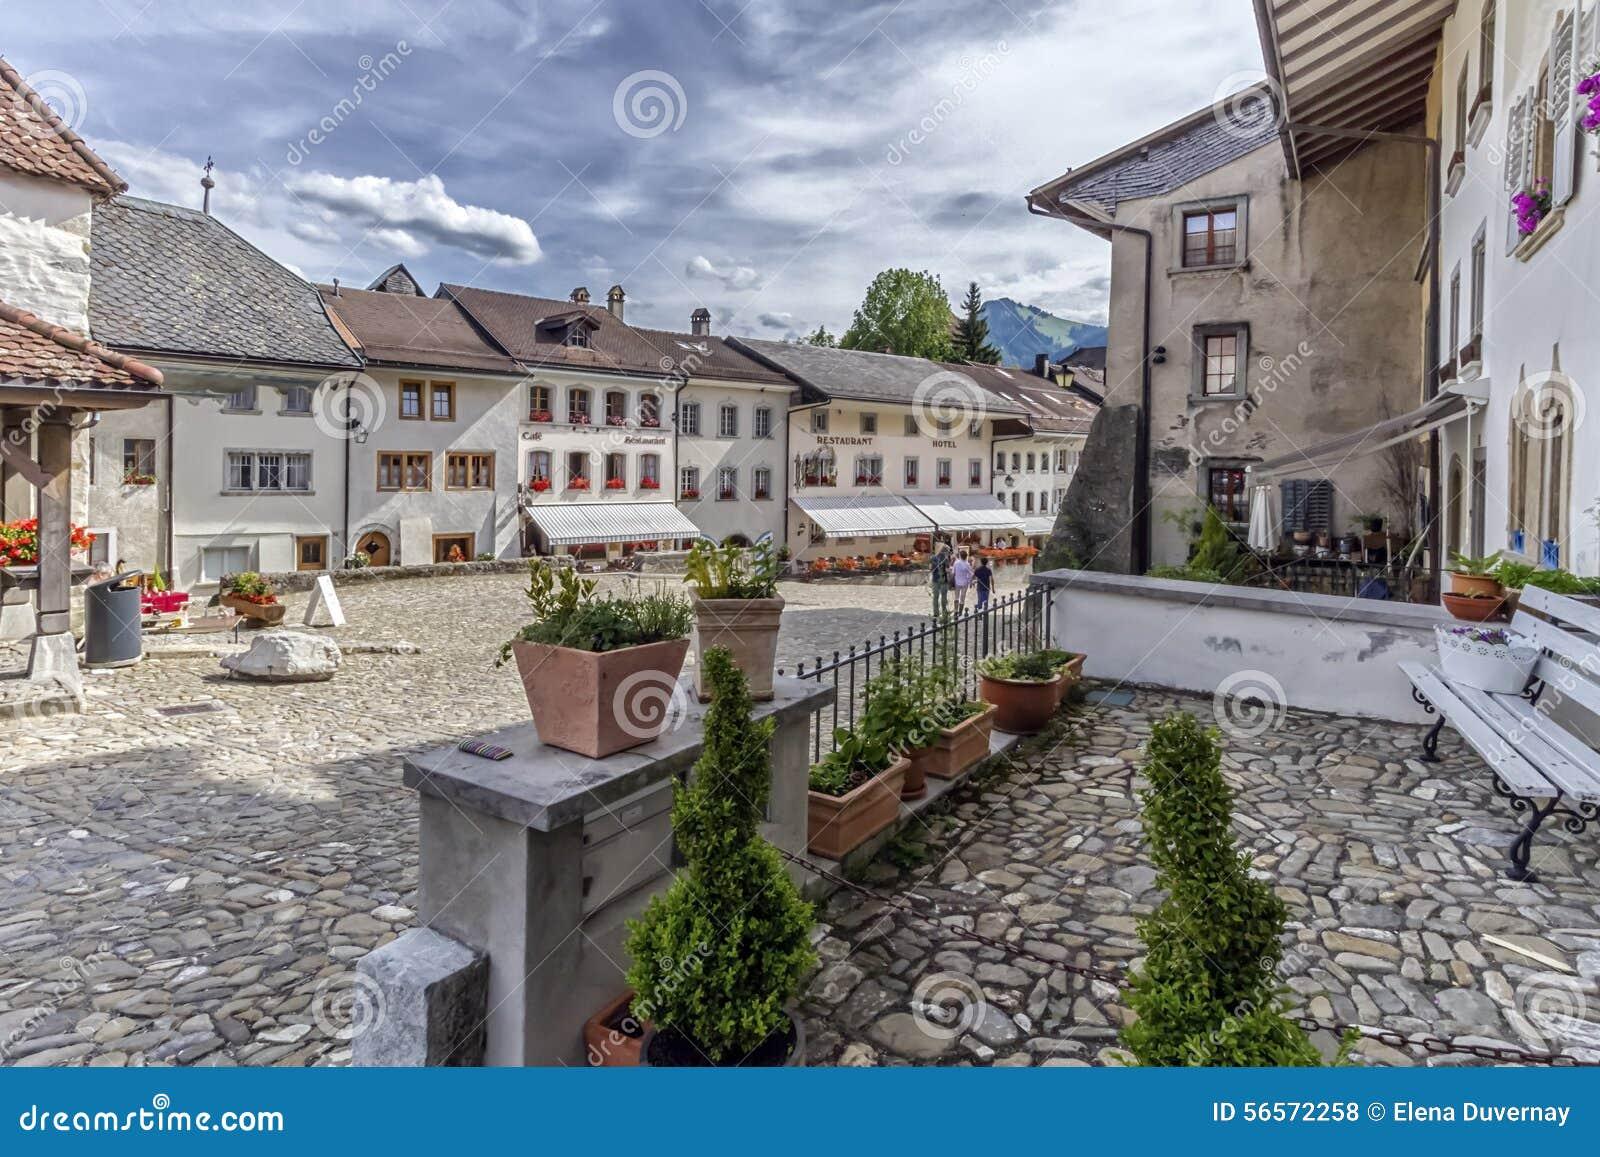 Download Οδός στο χωριό Gruyeres, Fribourg, Ελβετία Στοκ Εικόνες - εικόνα από βακκινίων, οδός: 56572258